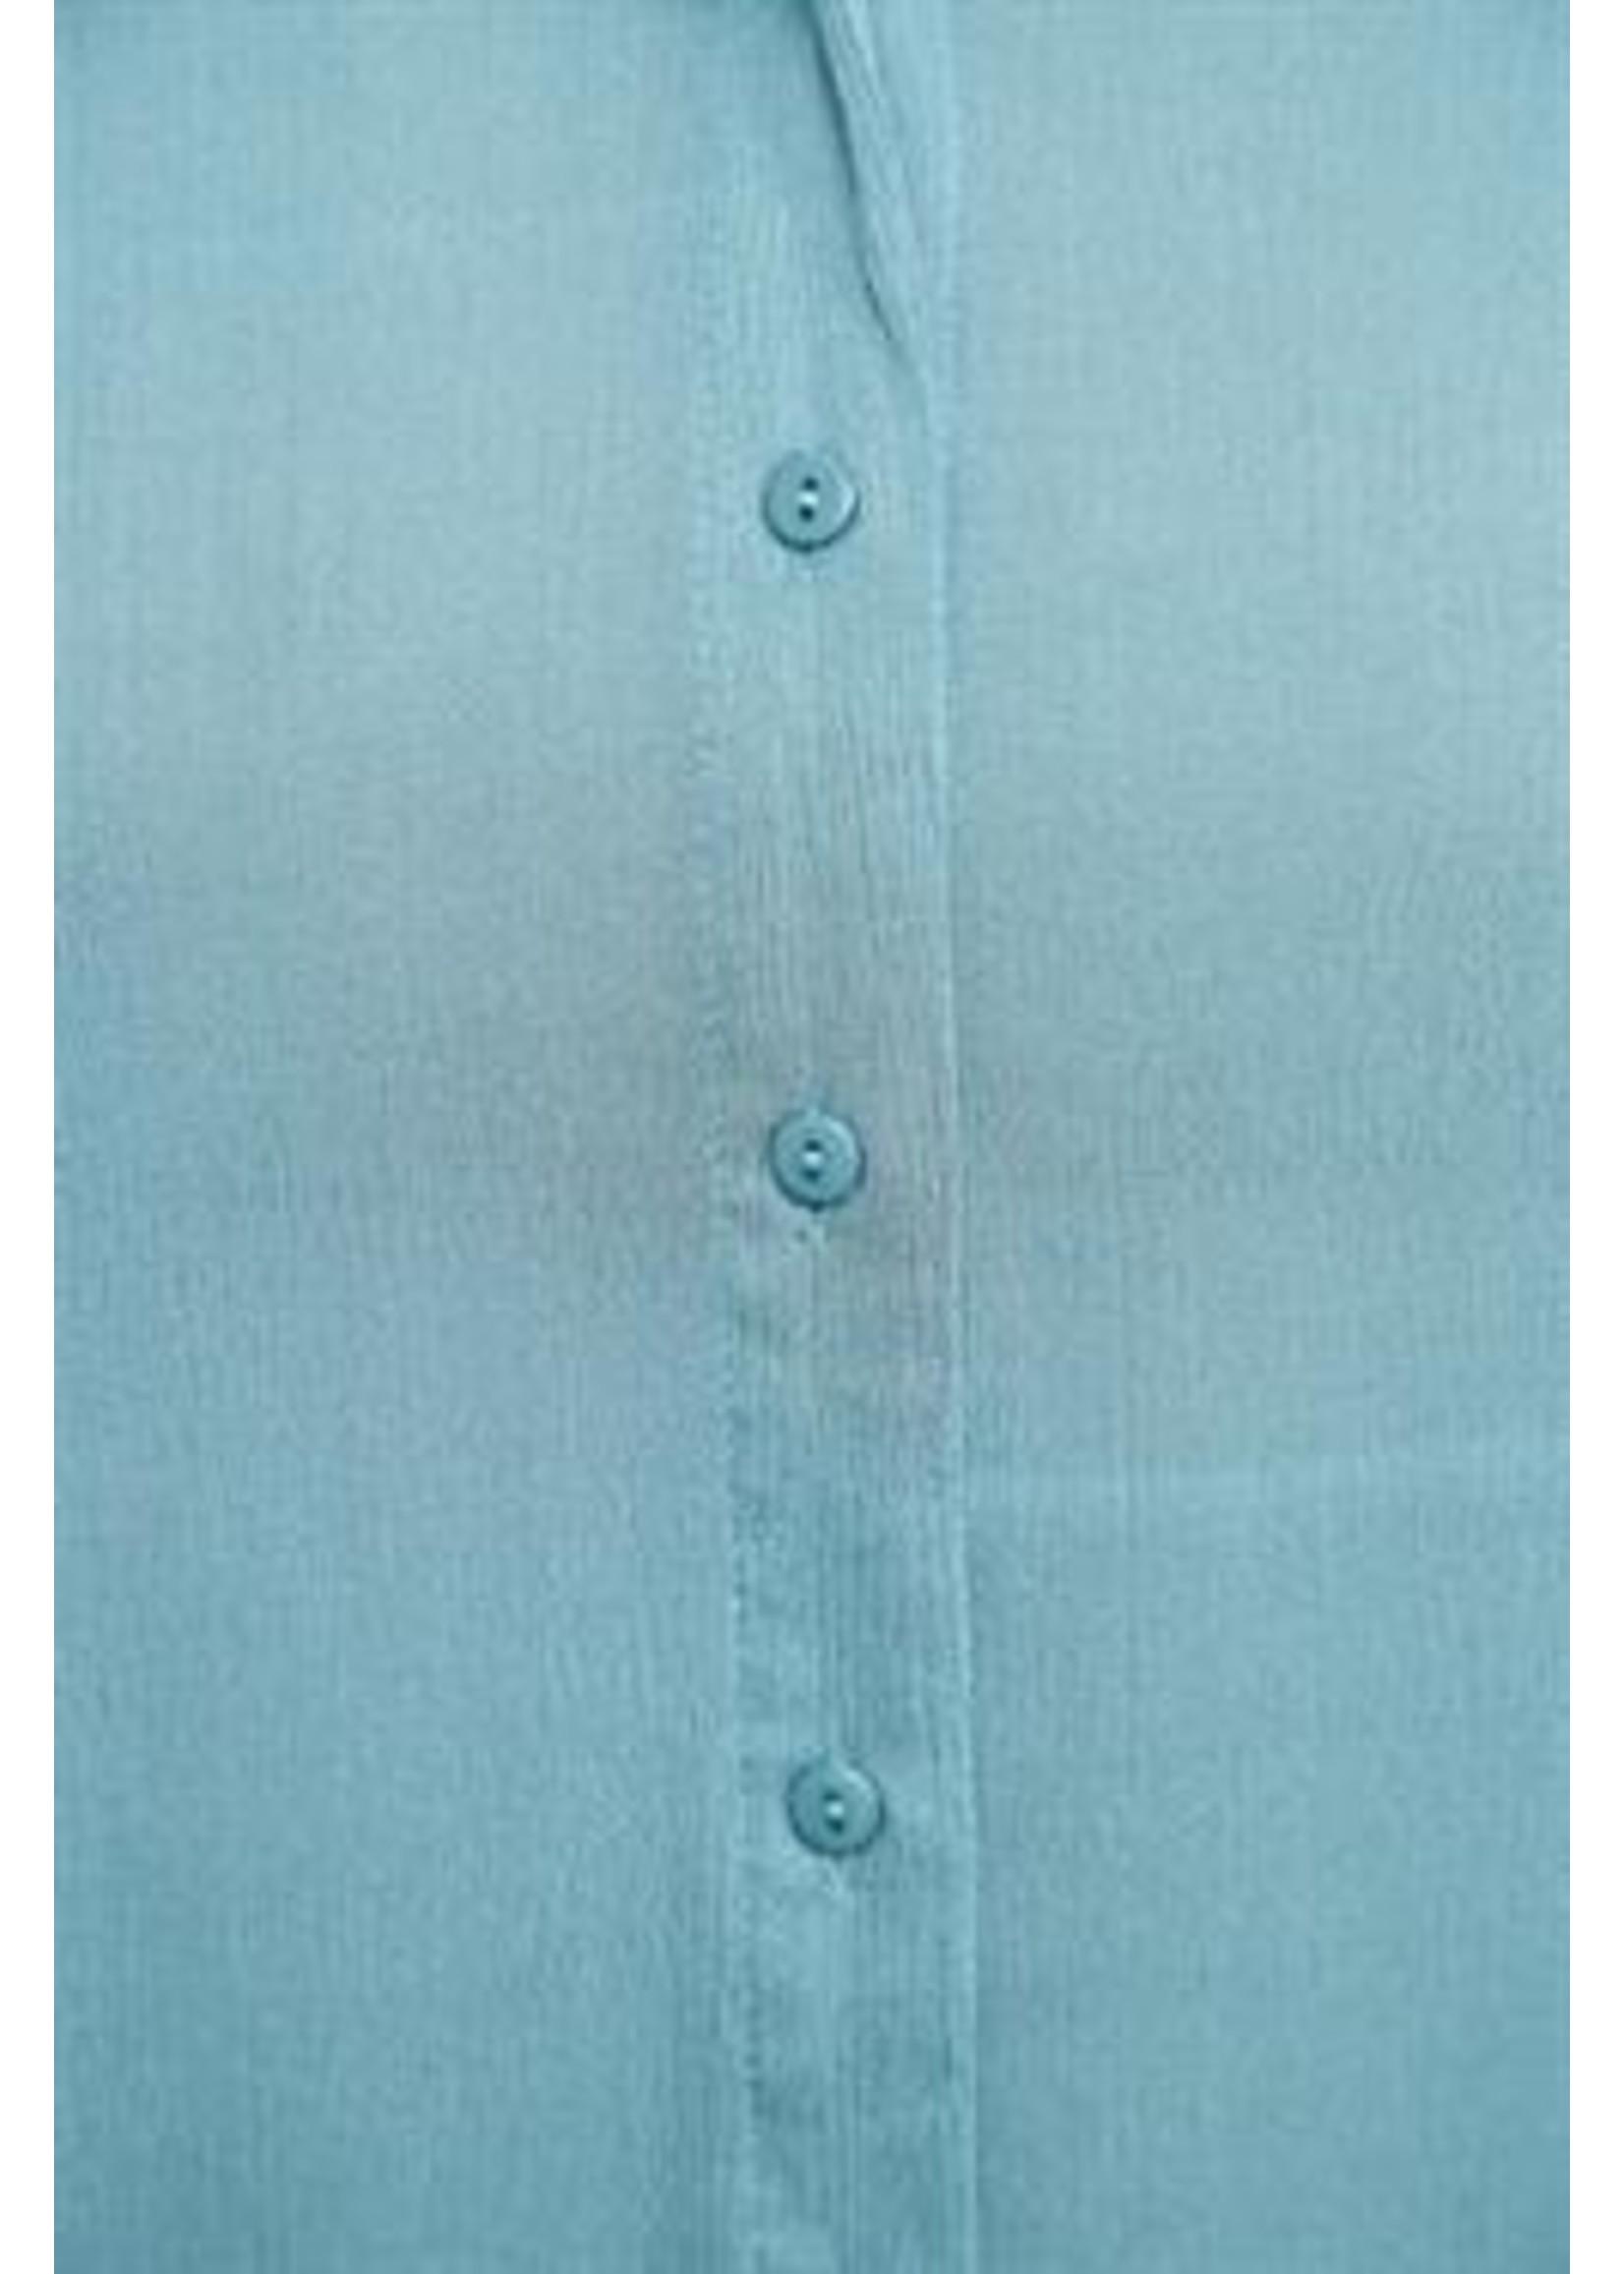 L Love Blue Ruffled Loose Top